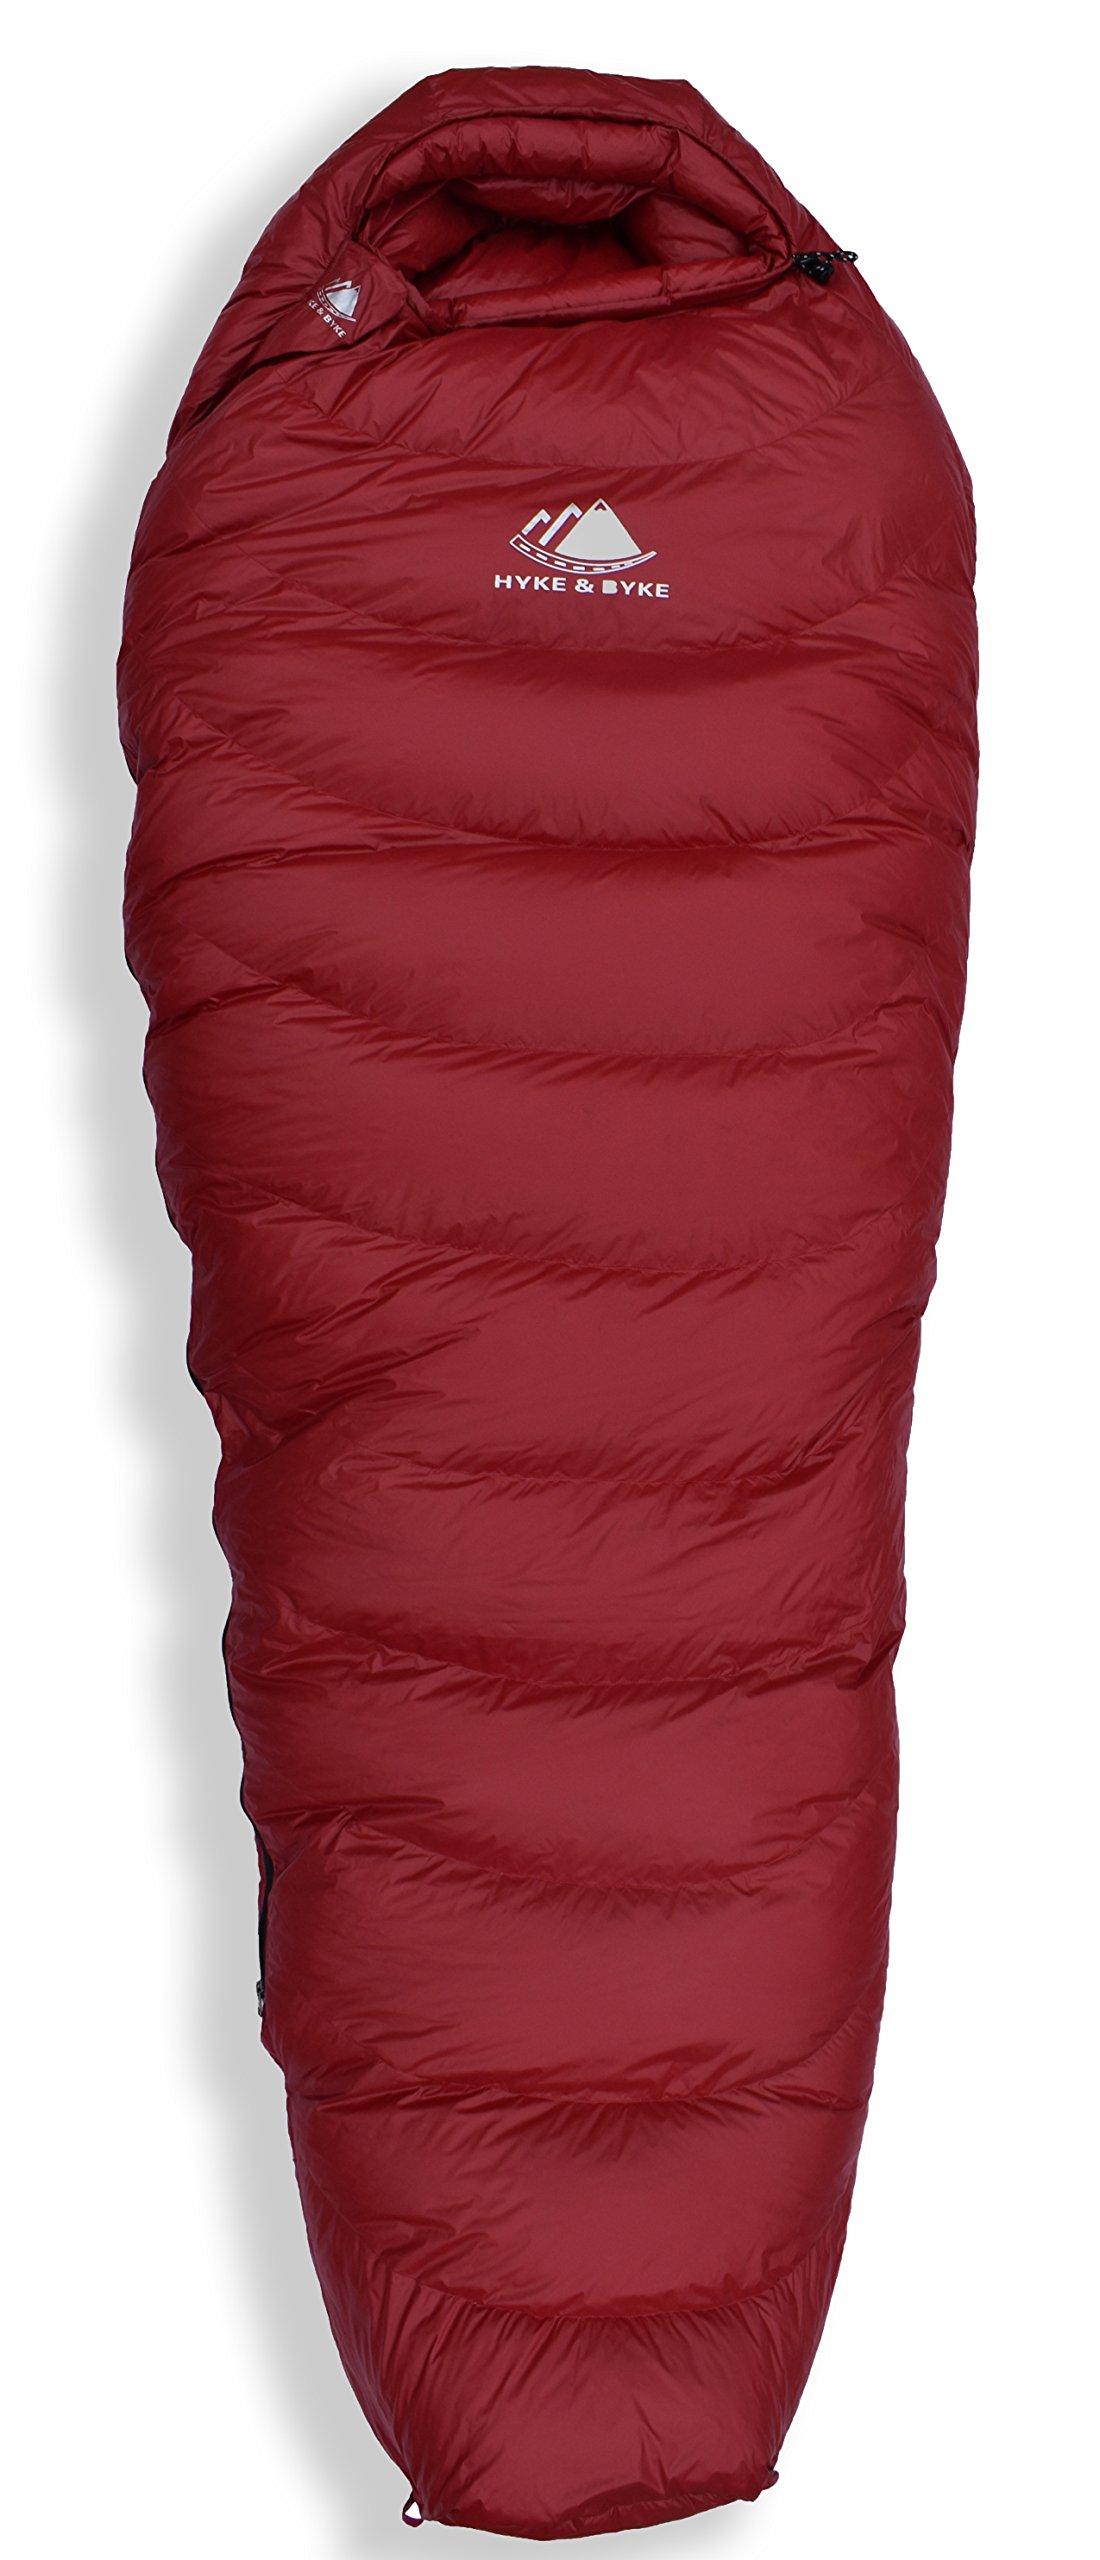 Hyke & Byke Quandary 15 Degree F 650 Fill Power Hydrophobic Down Sleeping Bag with ClusterLoft Base - Ultra Lightweight 3 Season Men's and Women's Mummy Bag Designed for Backpacking 7